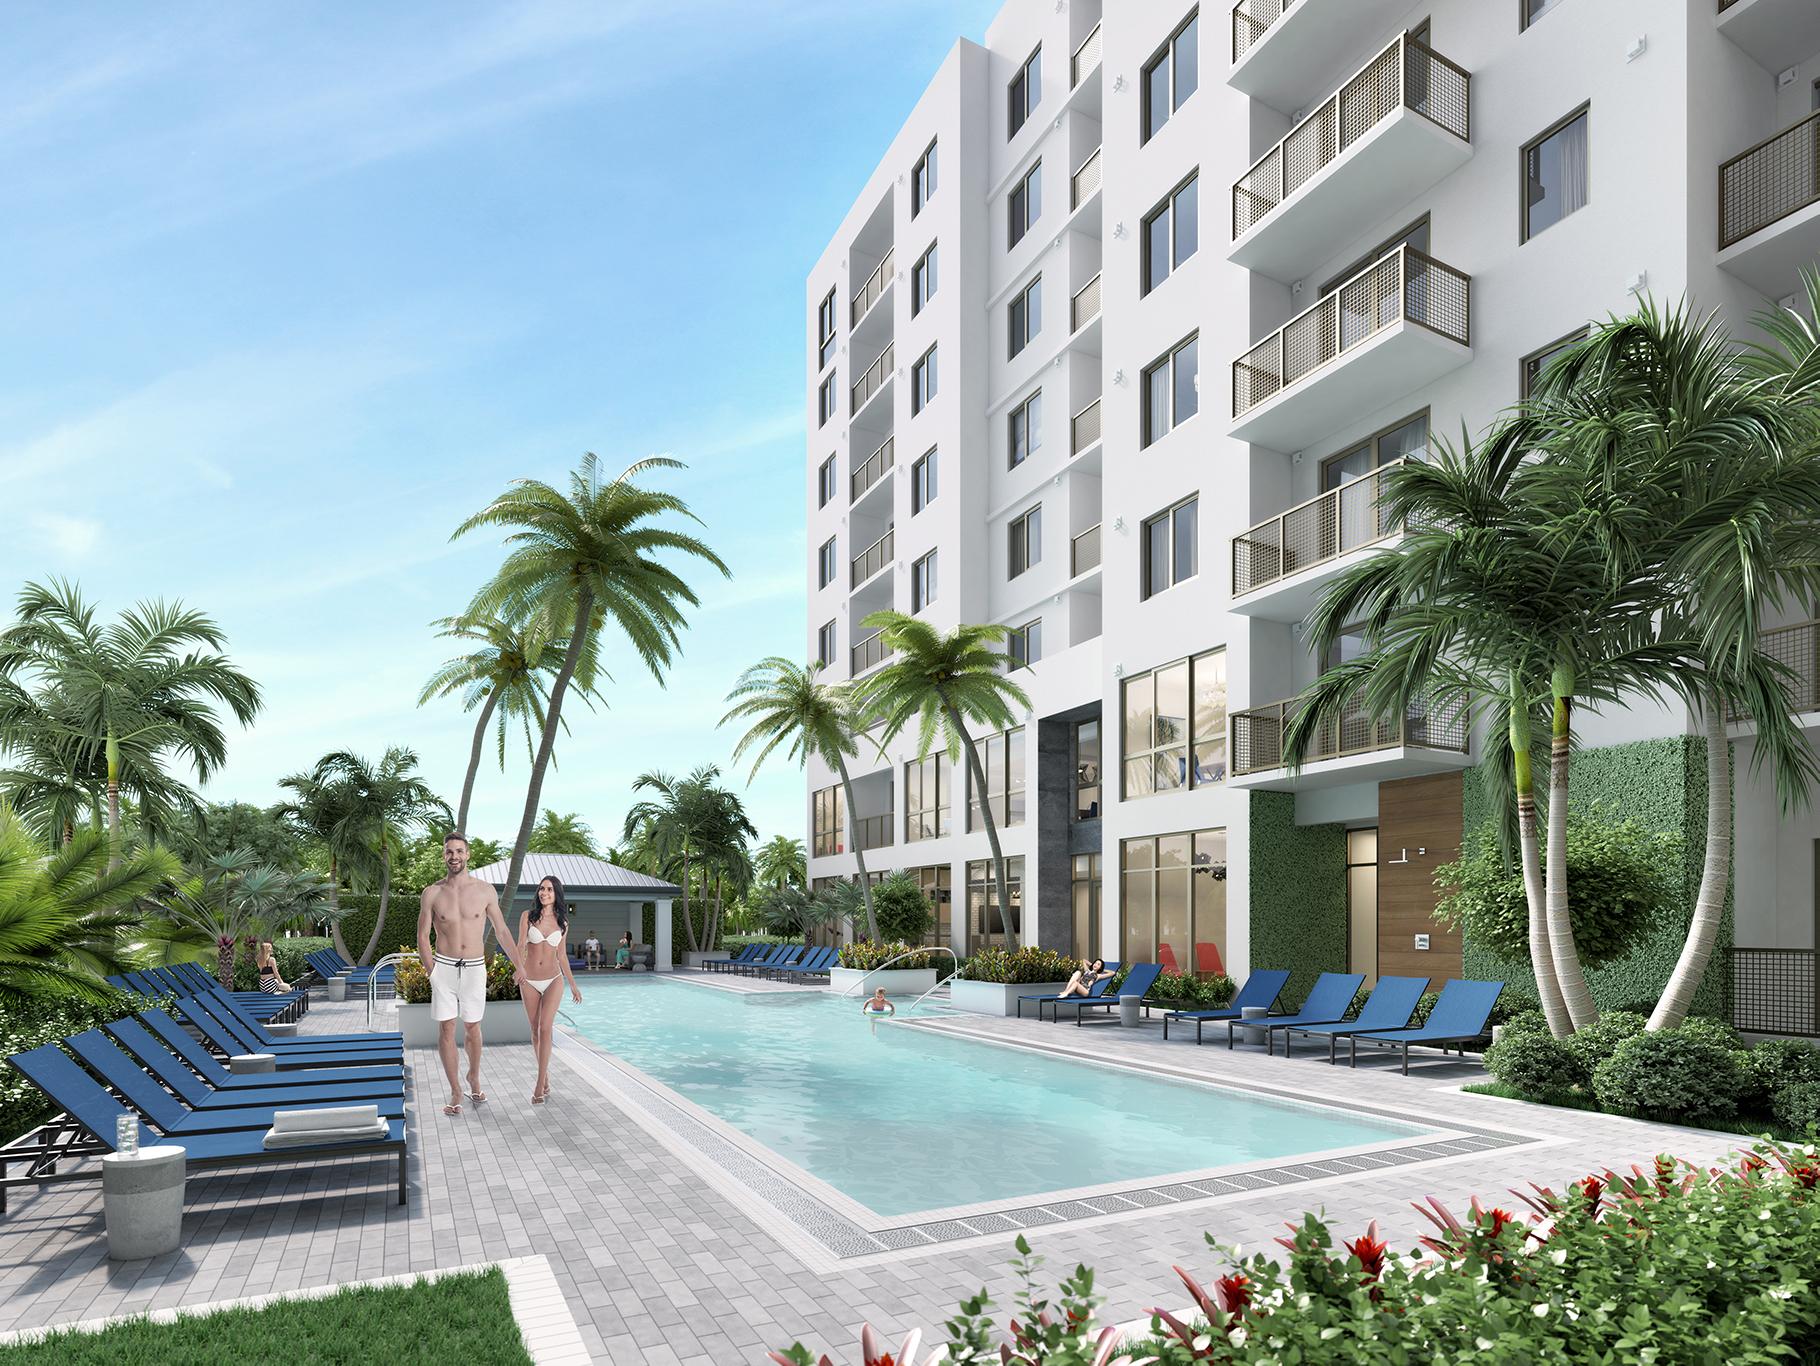 Pool lounge chairs palm trees